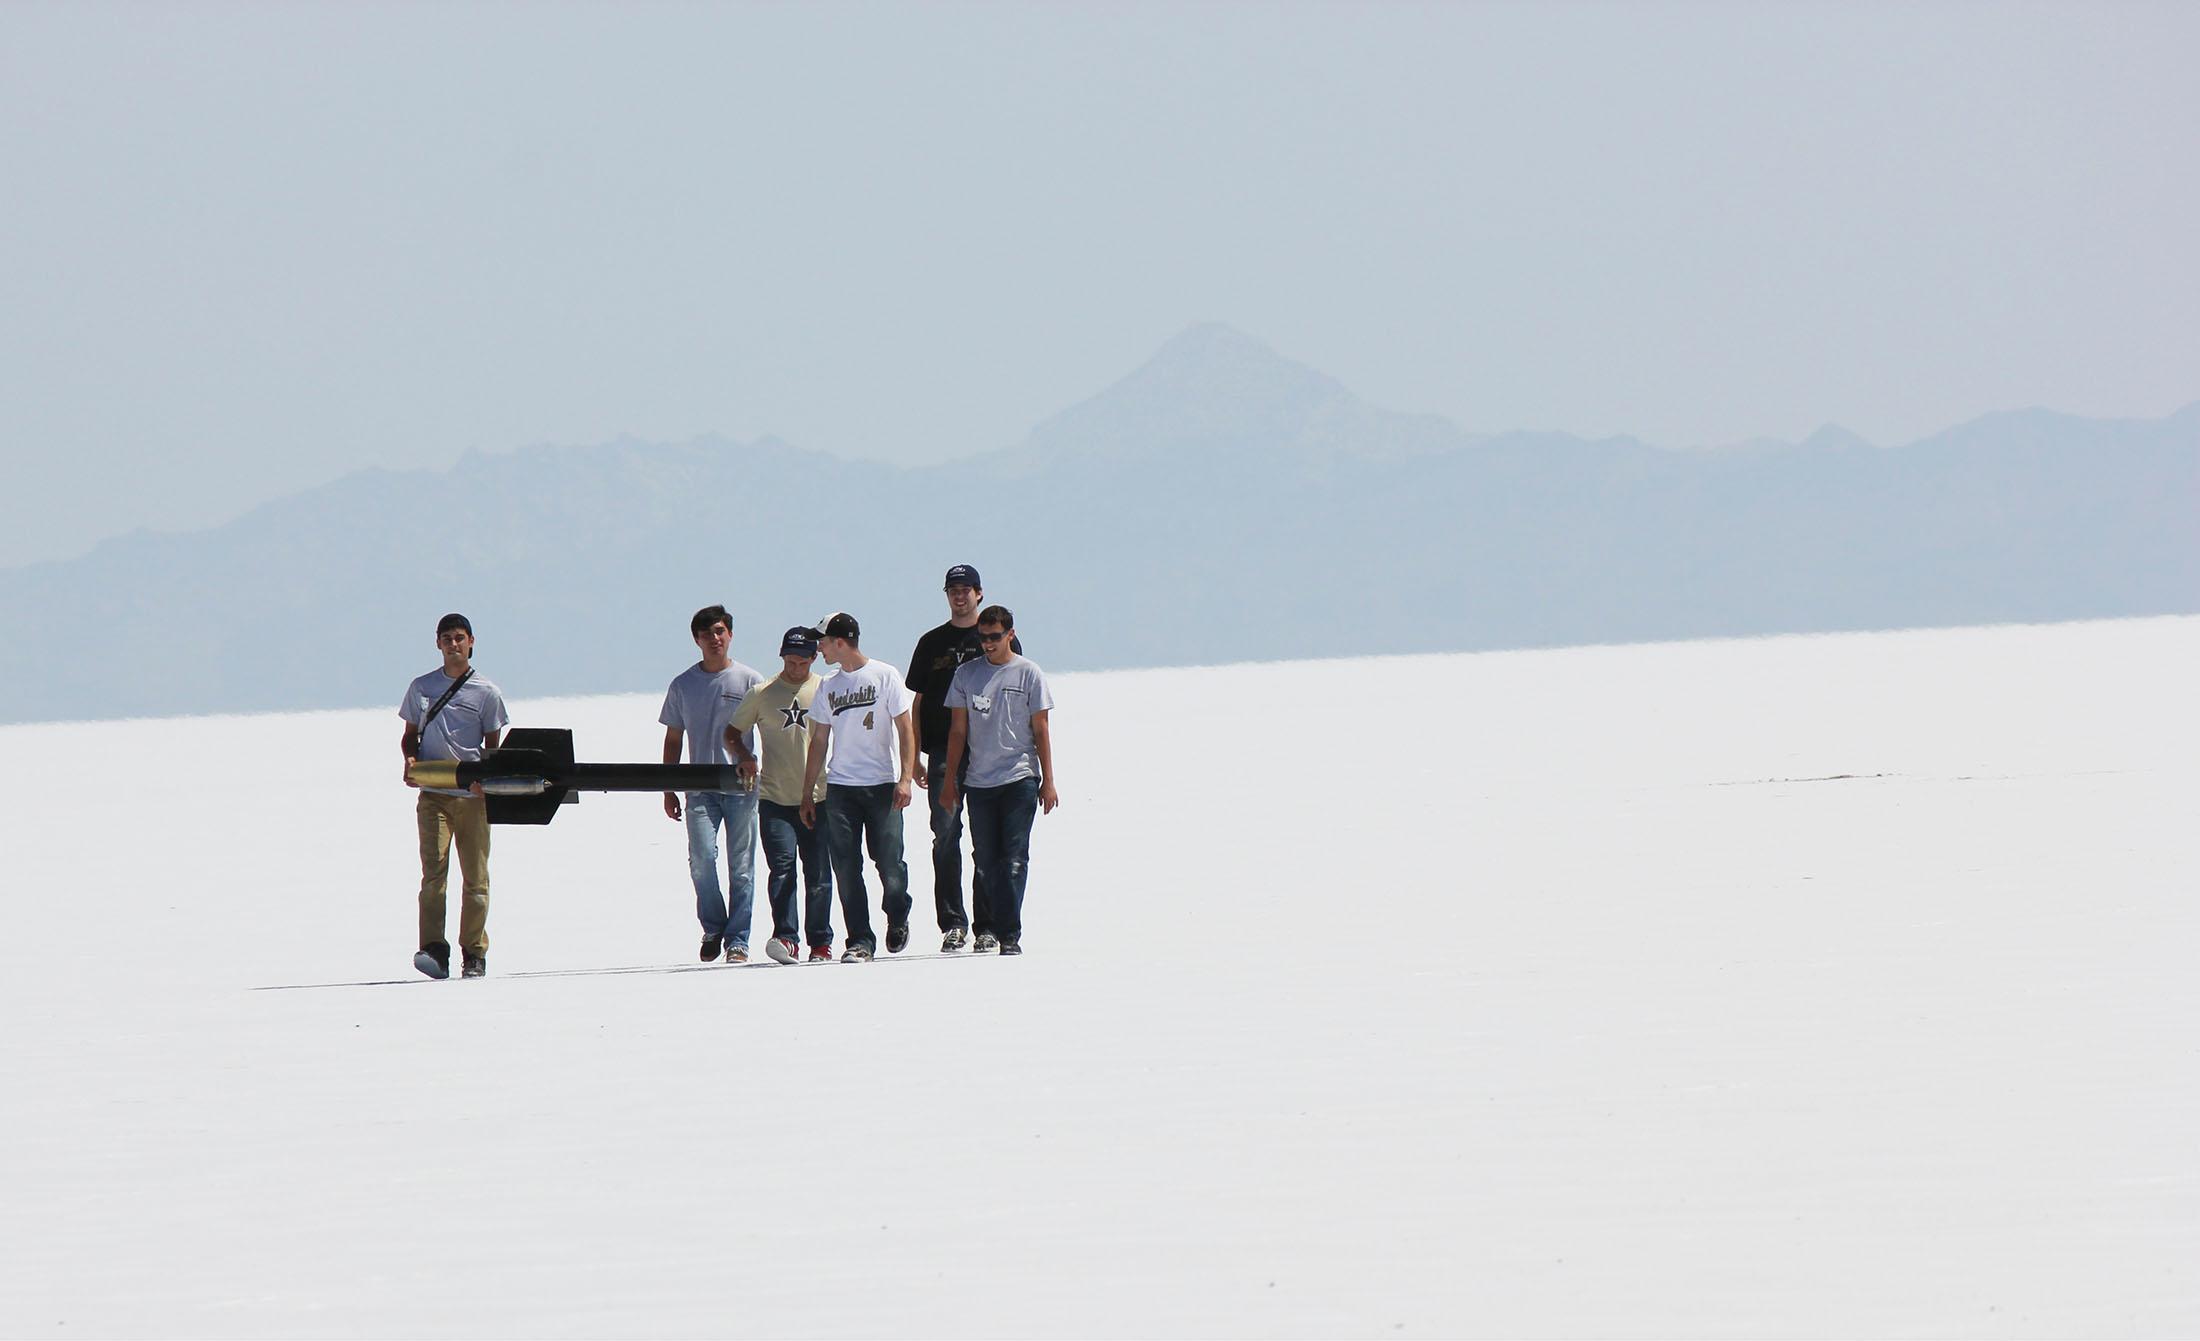 Student rocketeers on the Bonneville Salt Flats of Utah